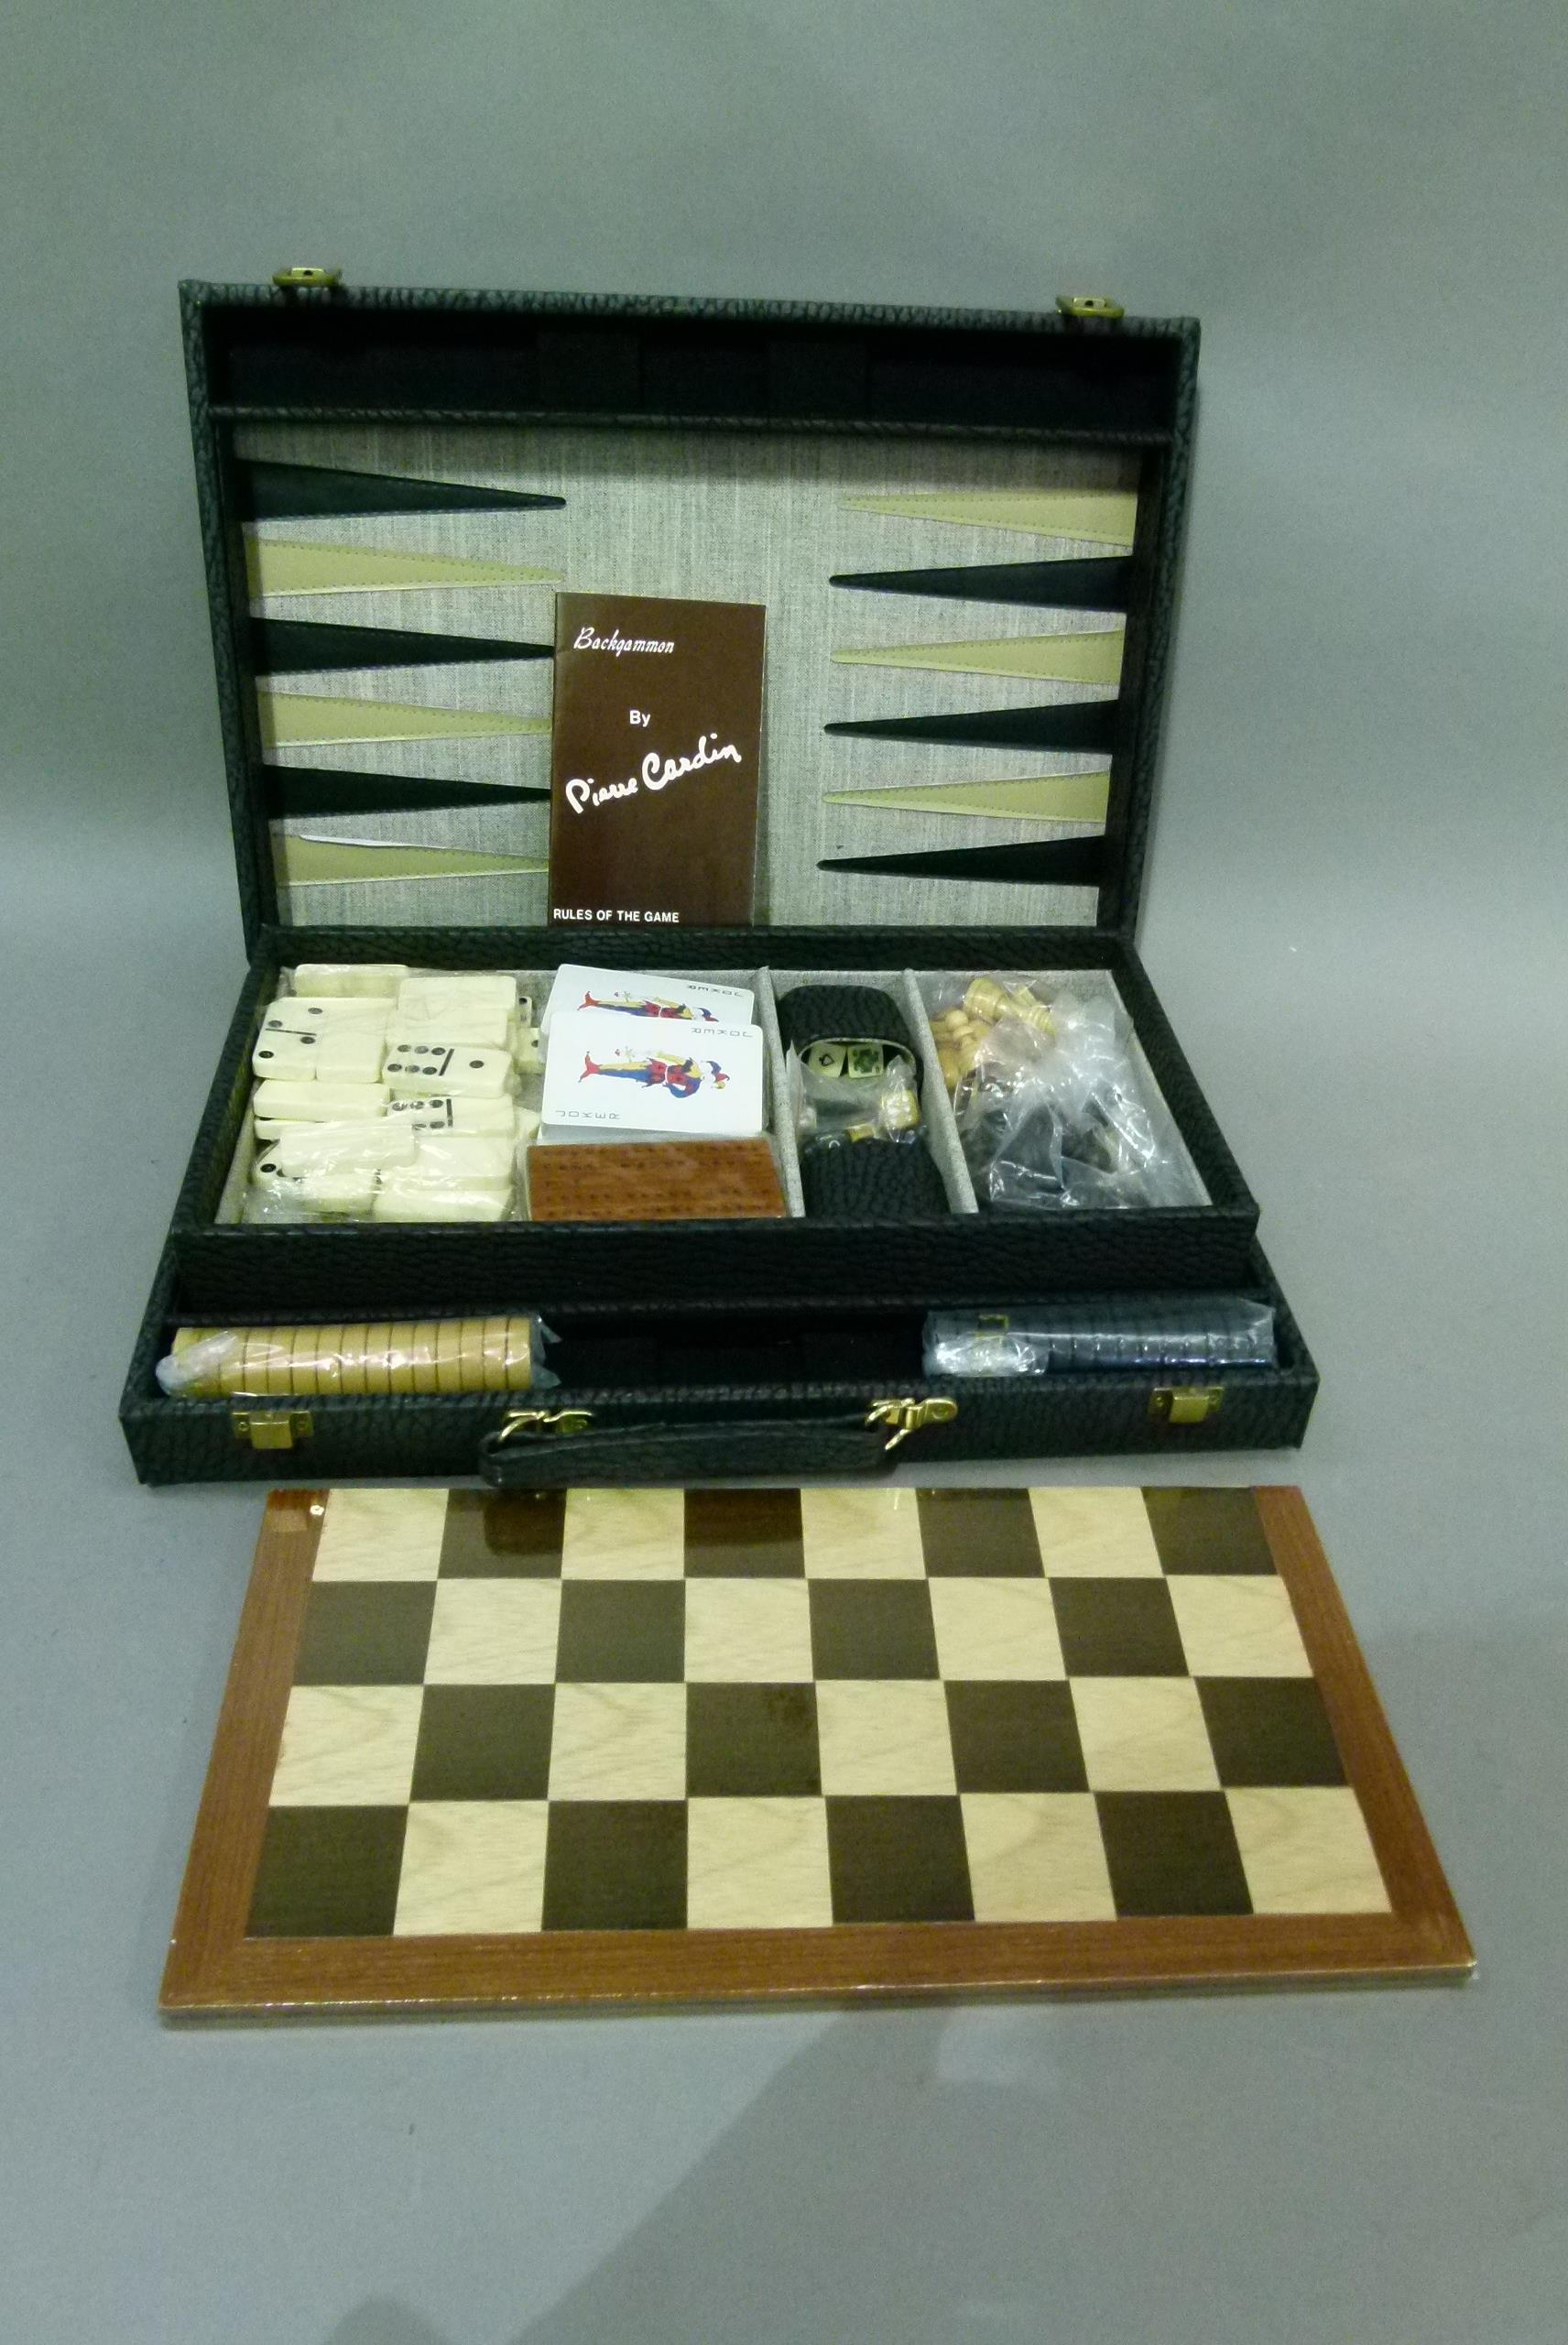 A games compendium comprising backgammon board, checkers board, dominos, cards, cribbage, dice and